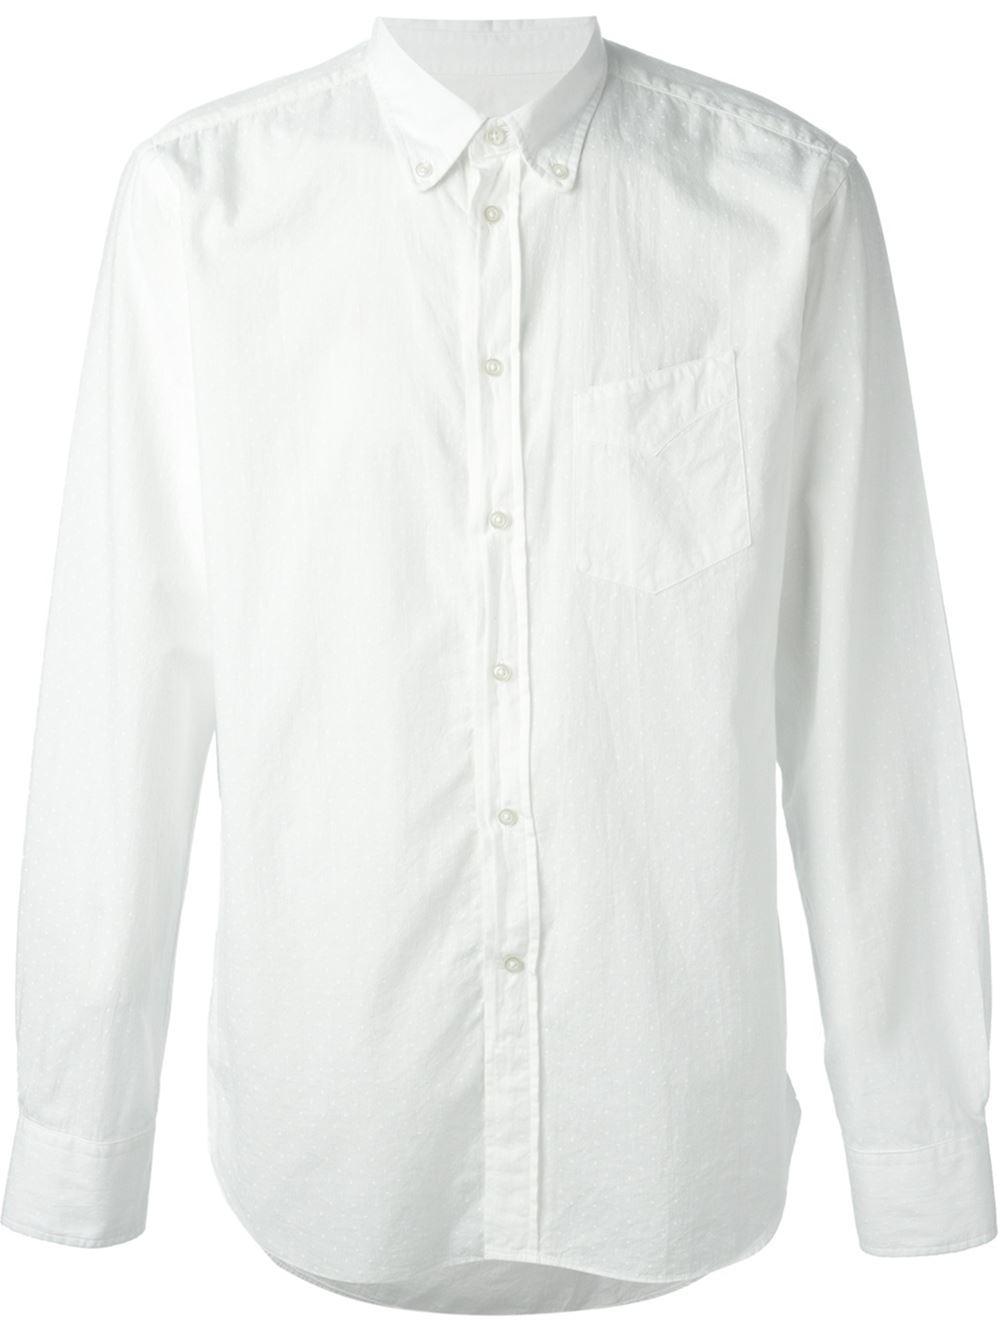 Officine generale polka dot button down shirt in white for for Button down polka dot shirt